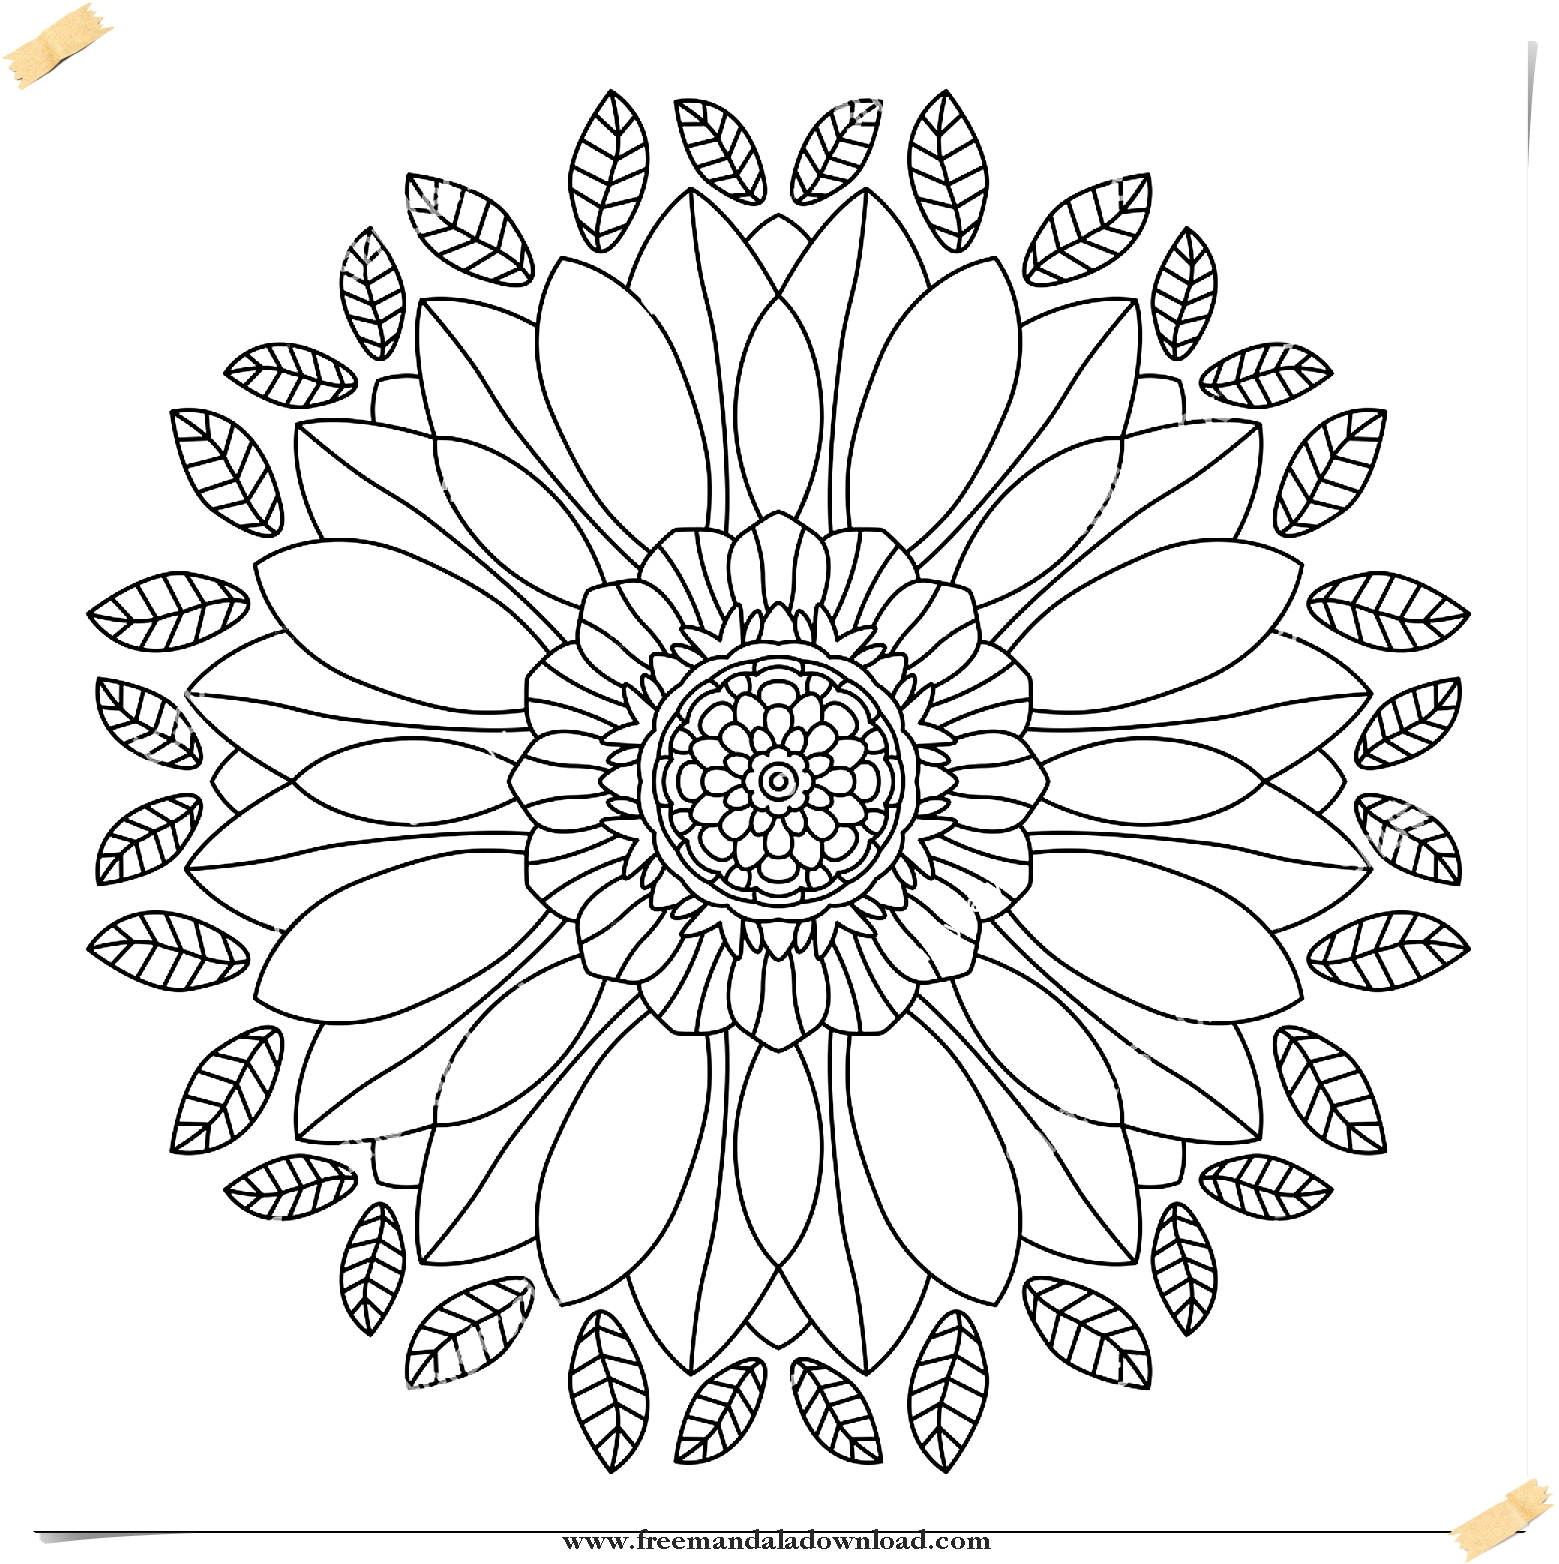 Liebe Mandala kostenloser Download-Love Mandala free download